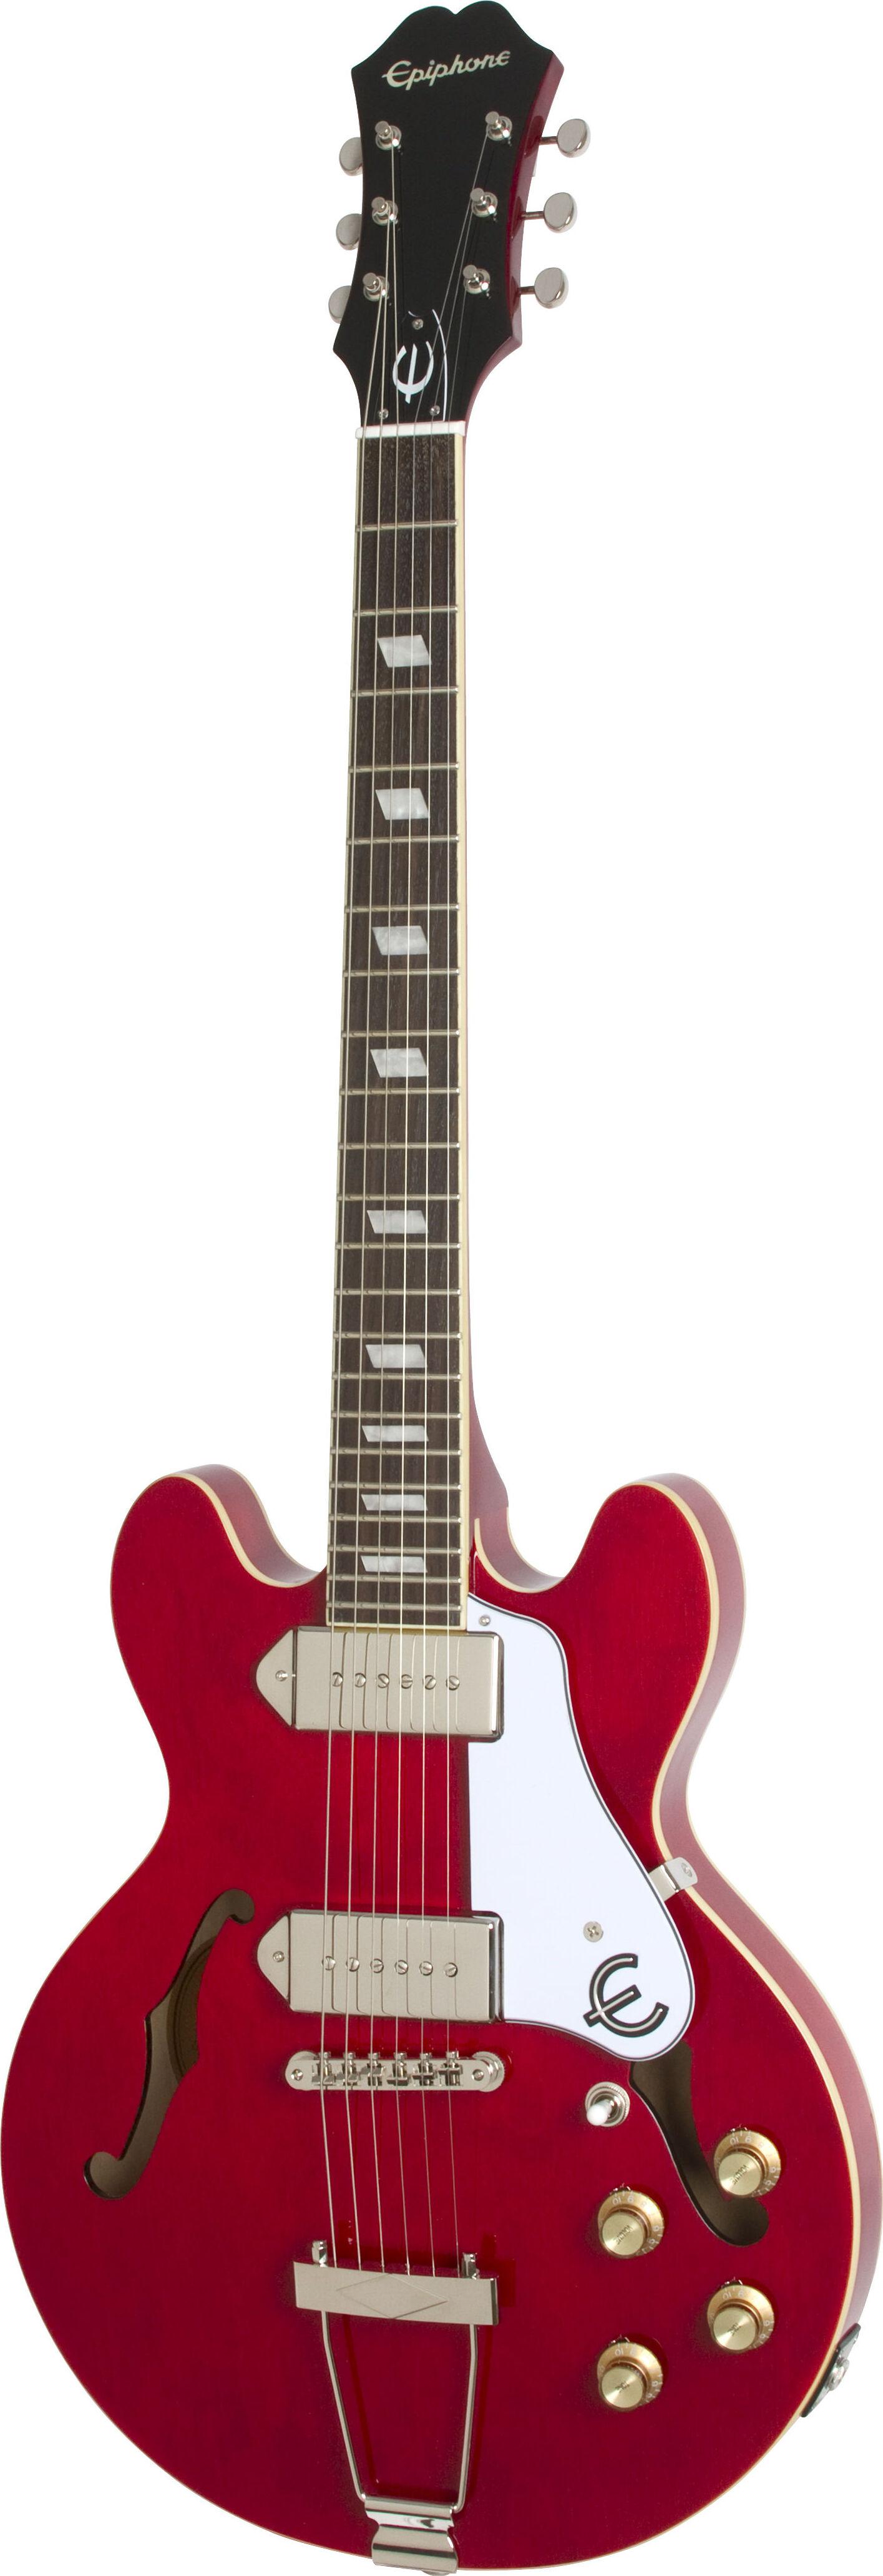 epiphone casino coupe guitare electrique cherry